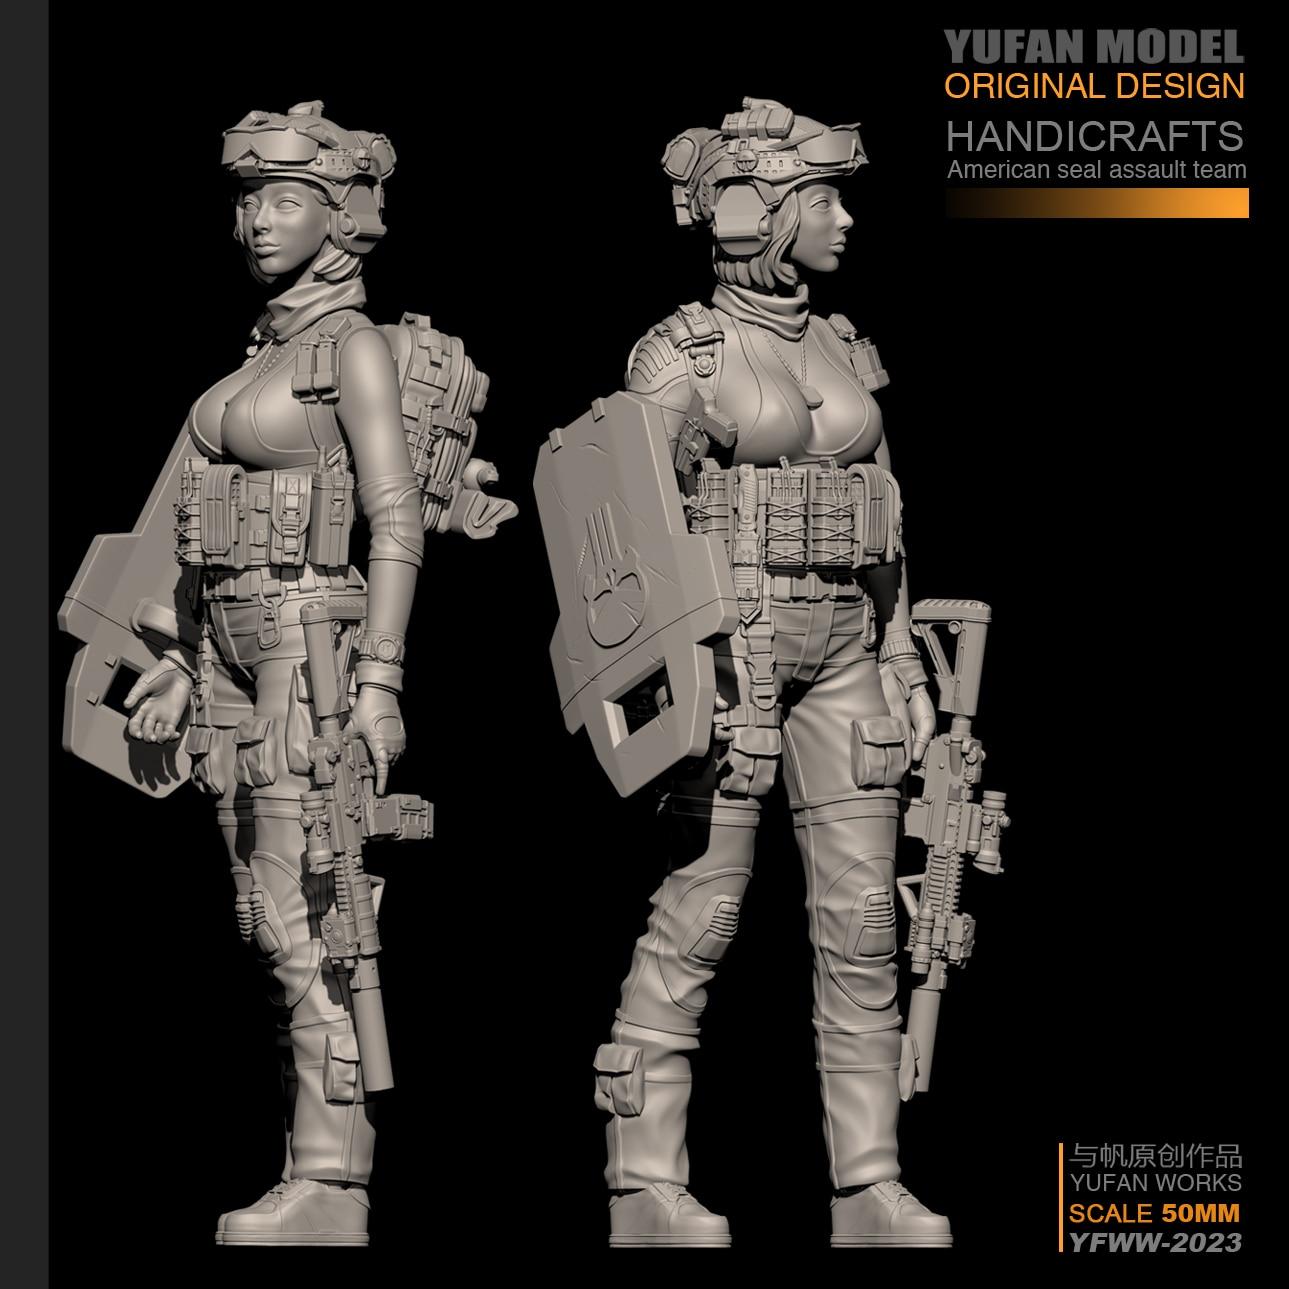 YUFan Model 1/35 Resin Kits Modern Female Soldier Self-assembled YFWW35-2023